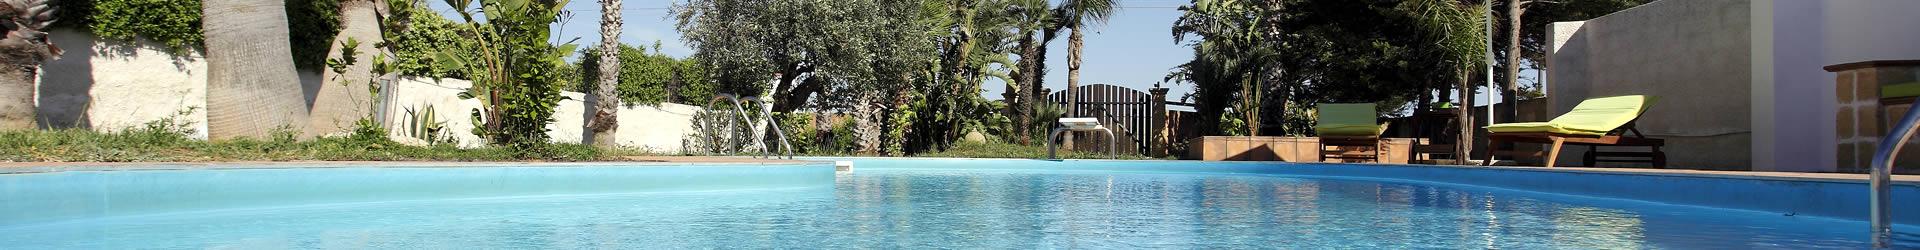 budget villas in Sicily